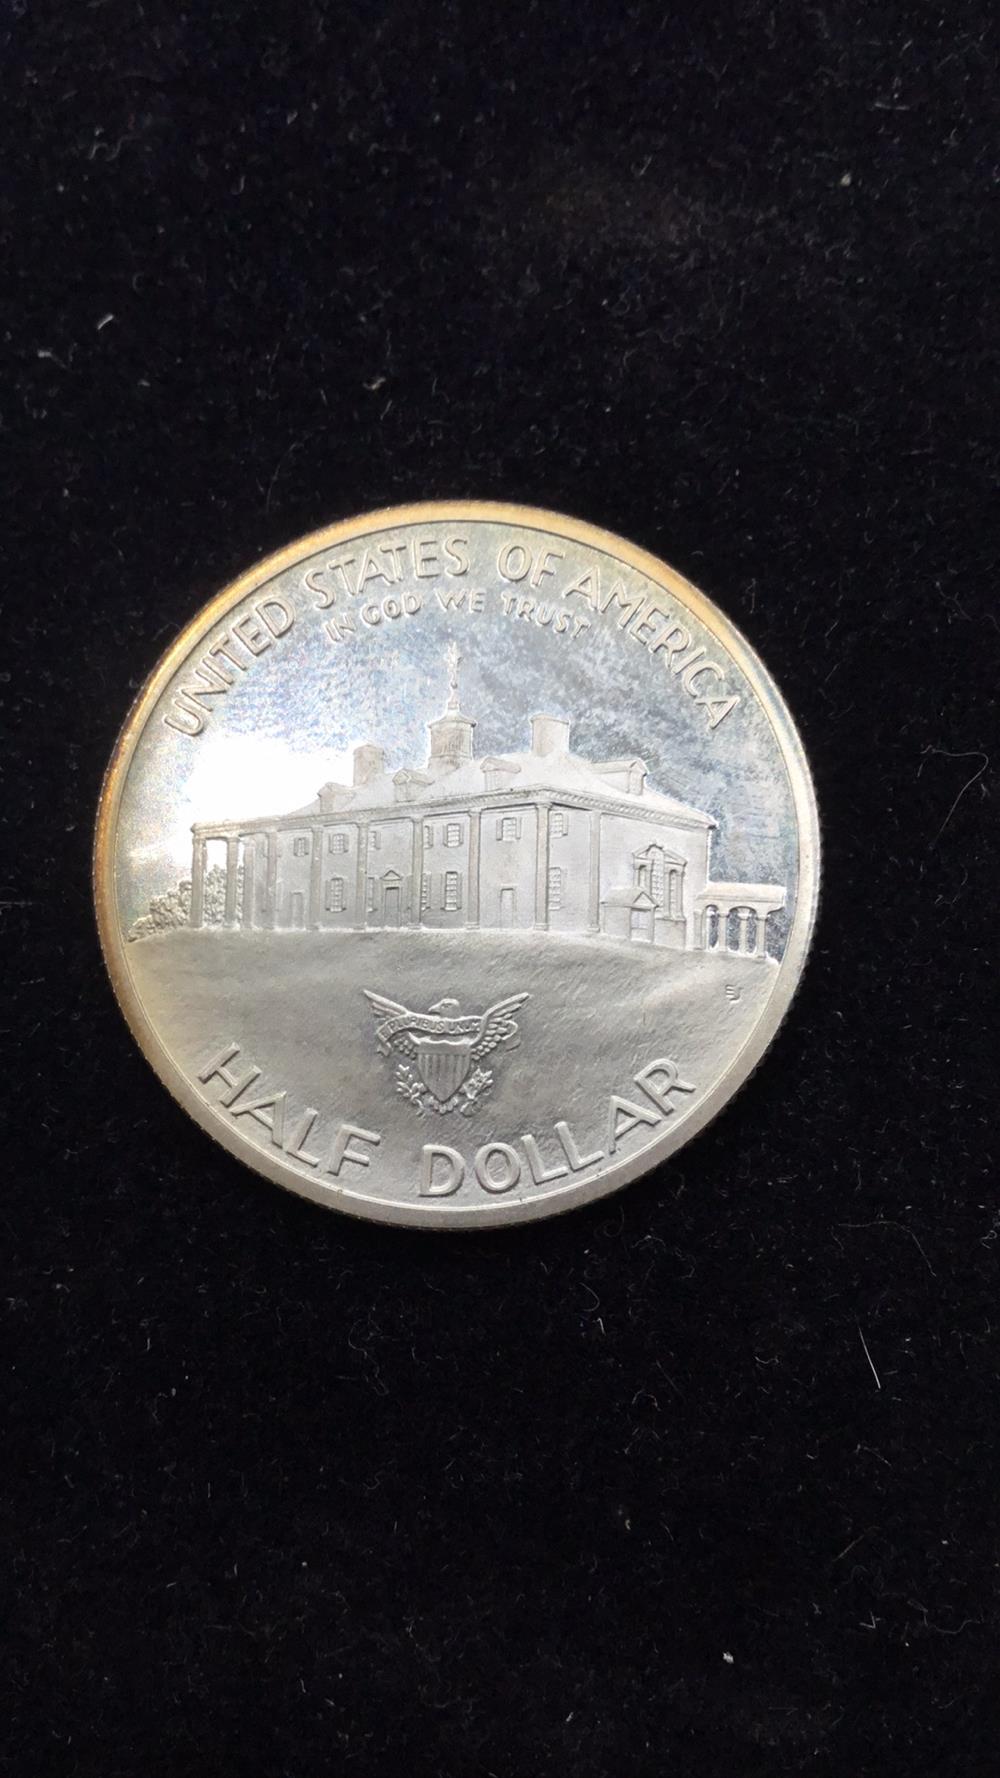 Lot 28: George Washington 250th anniversary Half Dollar